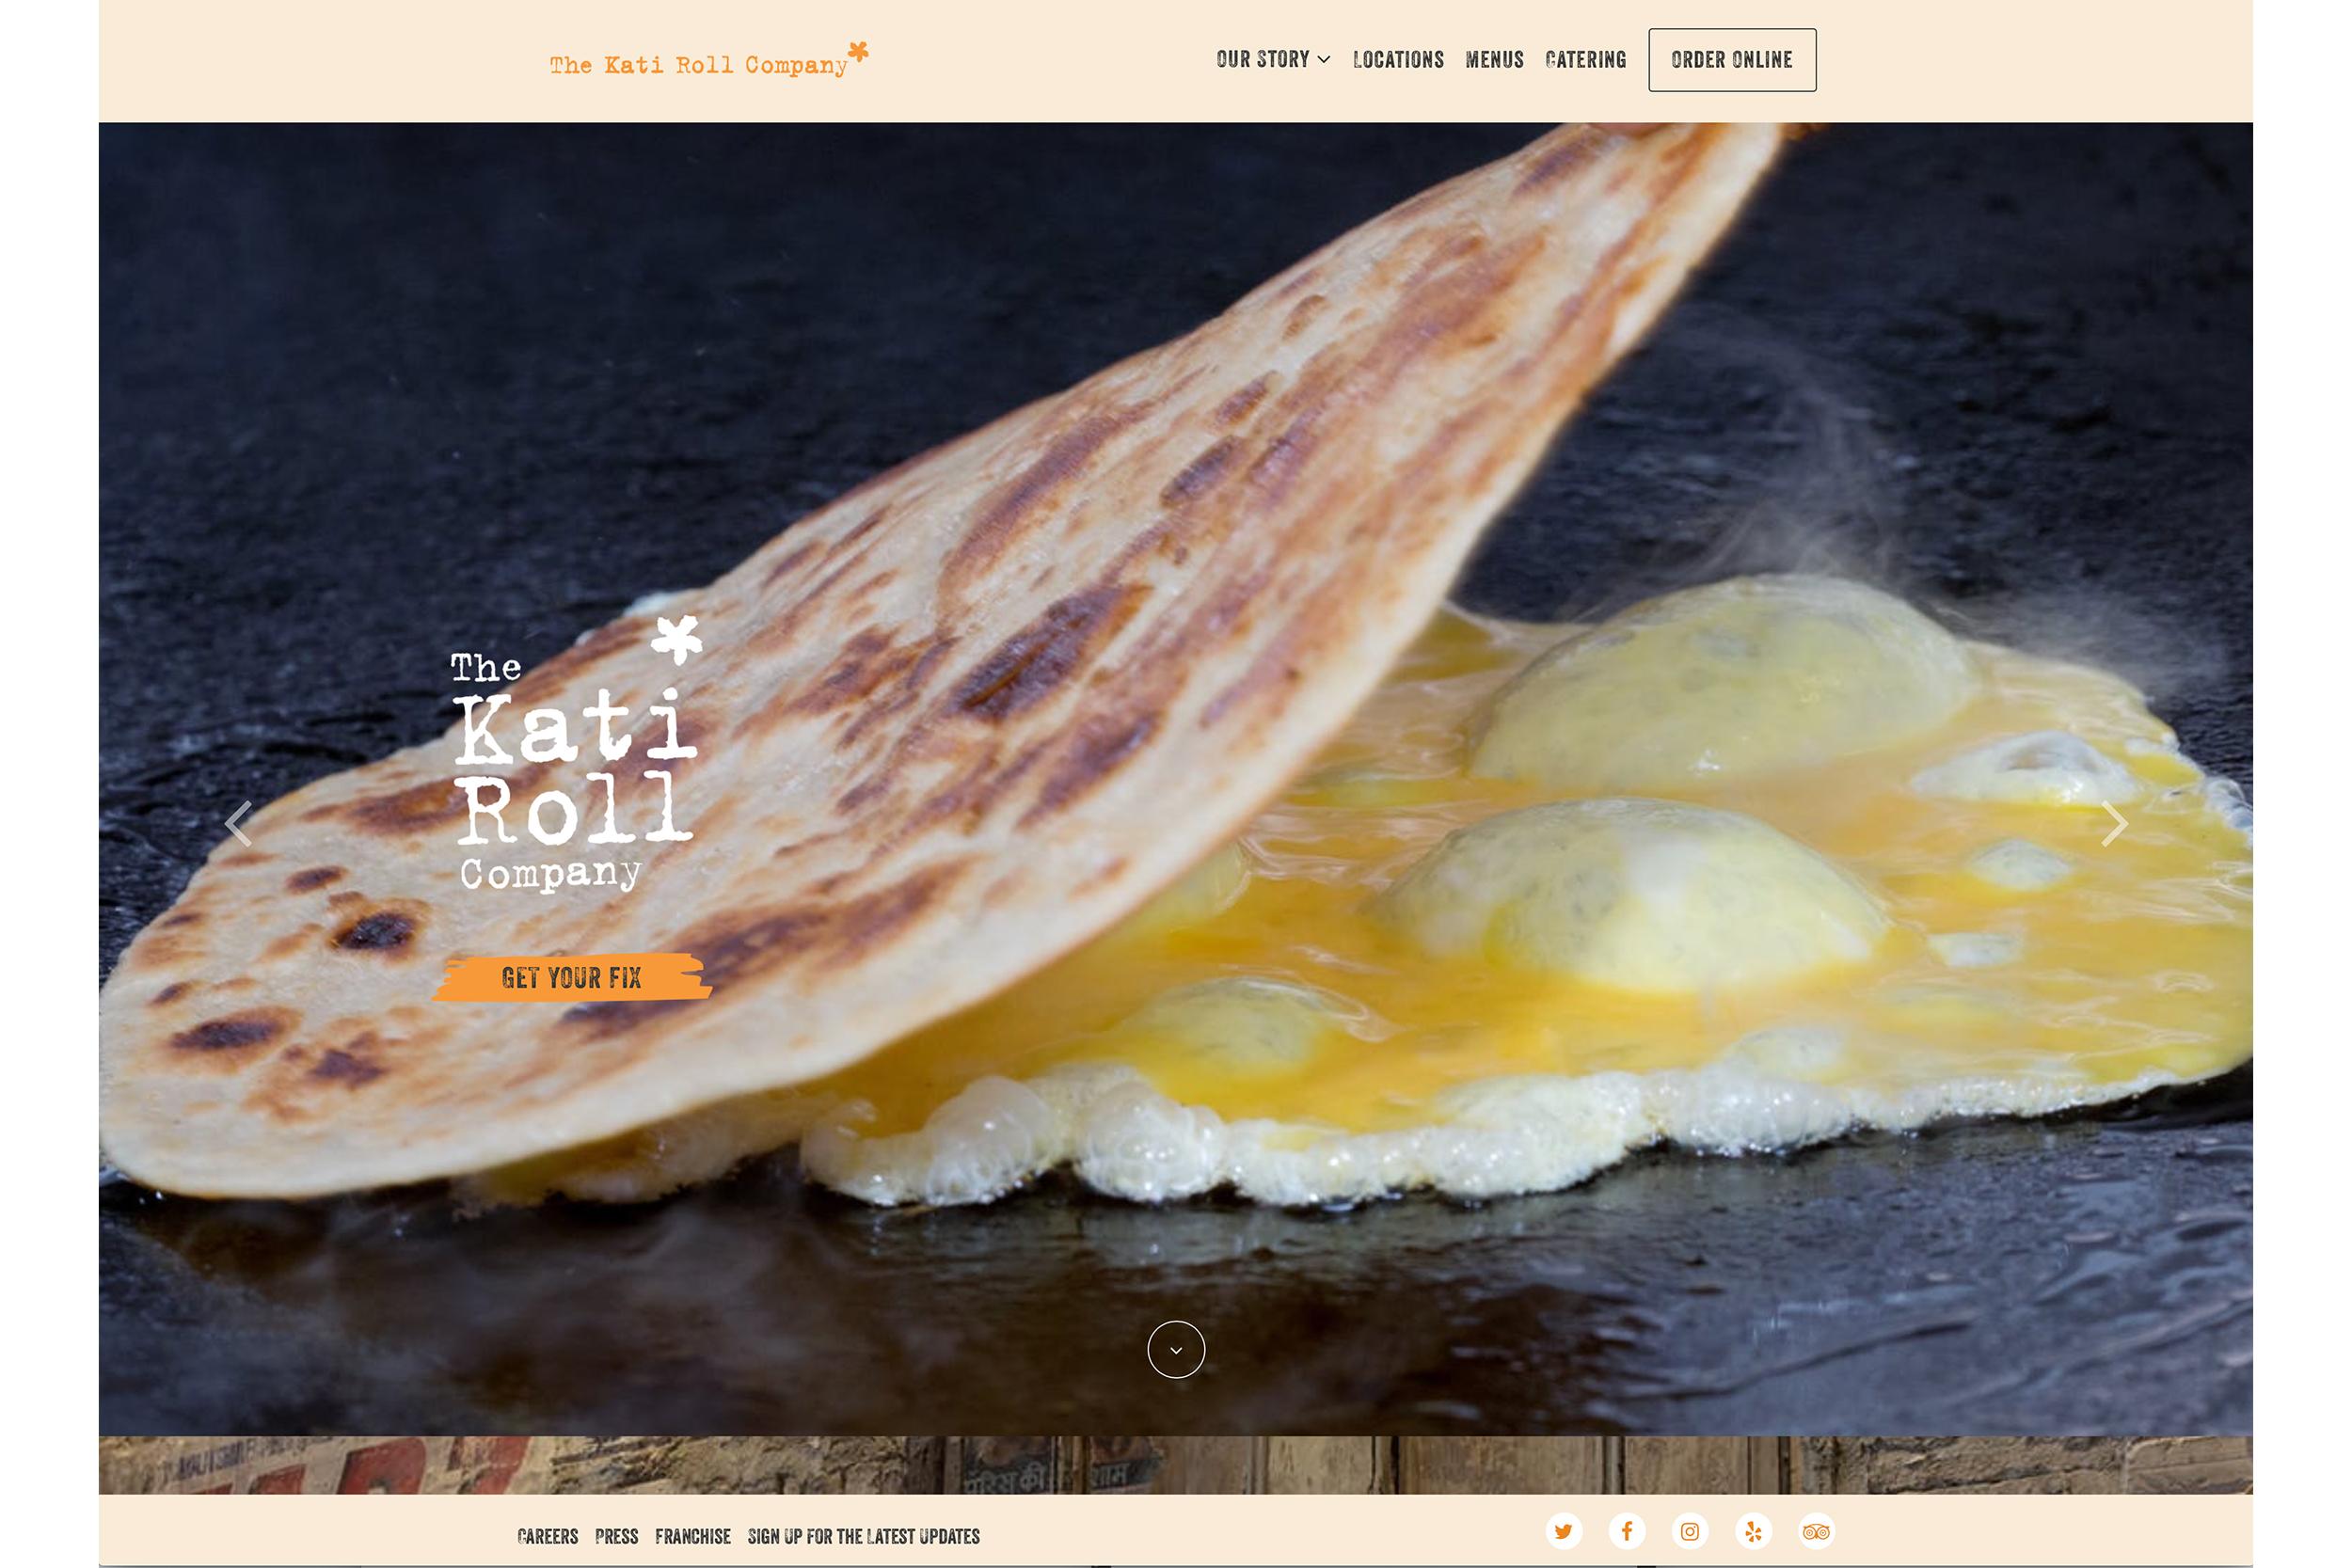 Michael Berman Food and Restaurant Photography - For Kati Roll Company Restaurants